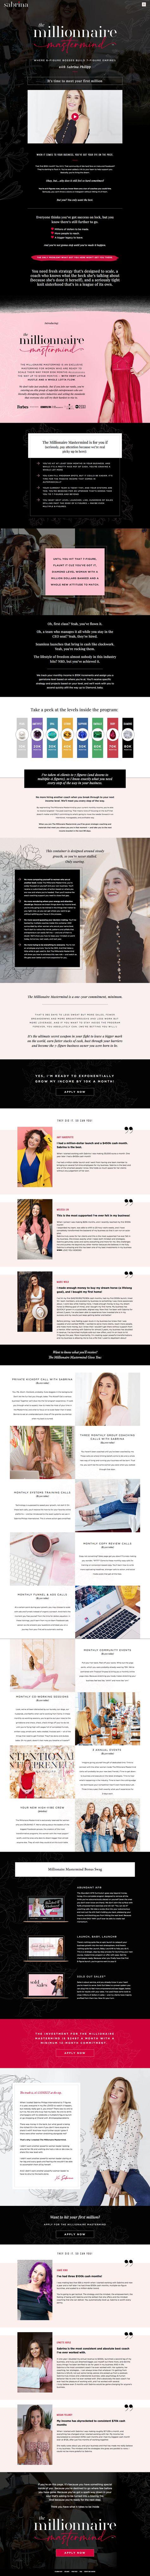 Sabrina Philipp Millionnaire Mastermind Sales Page Design